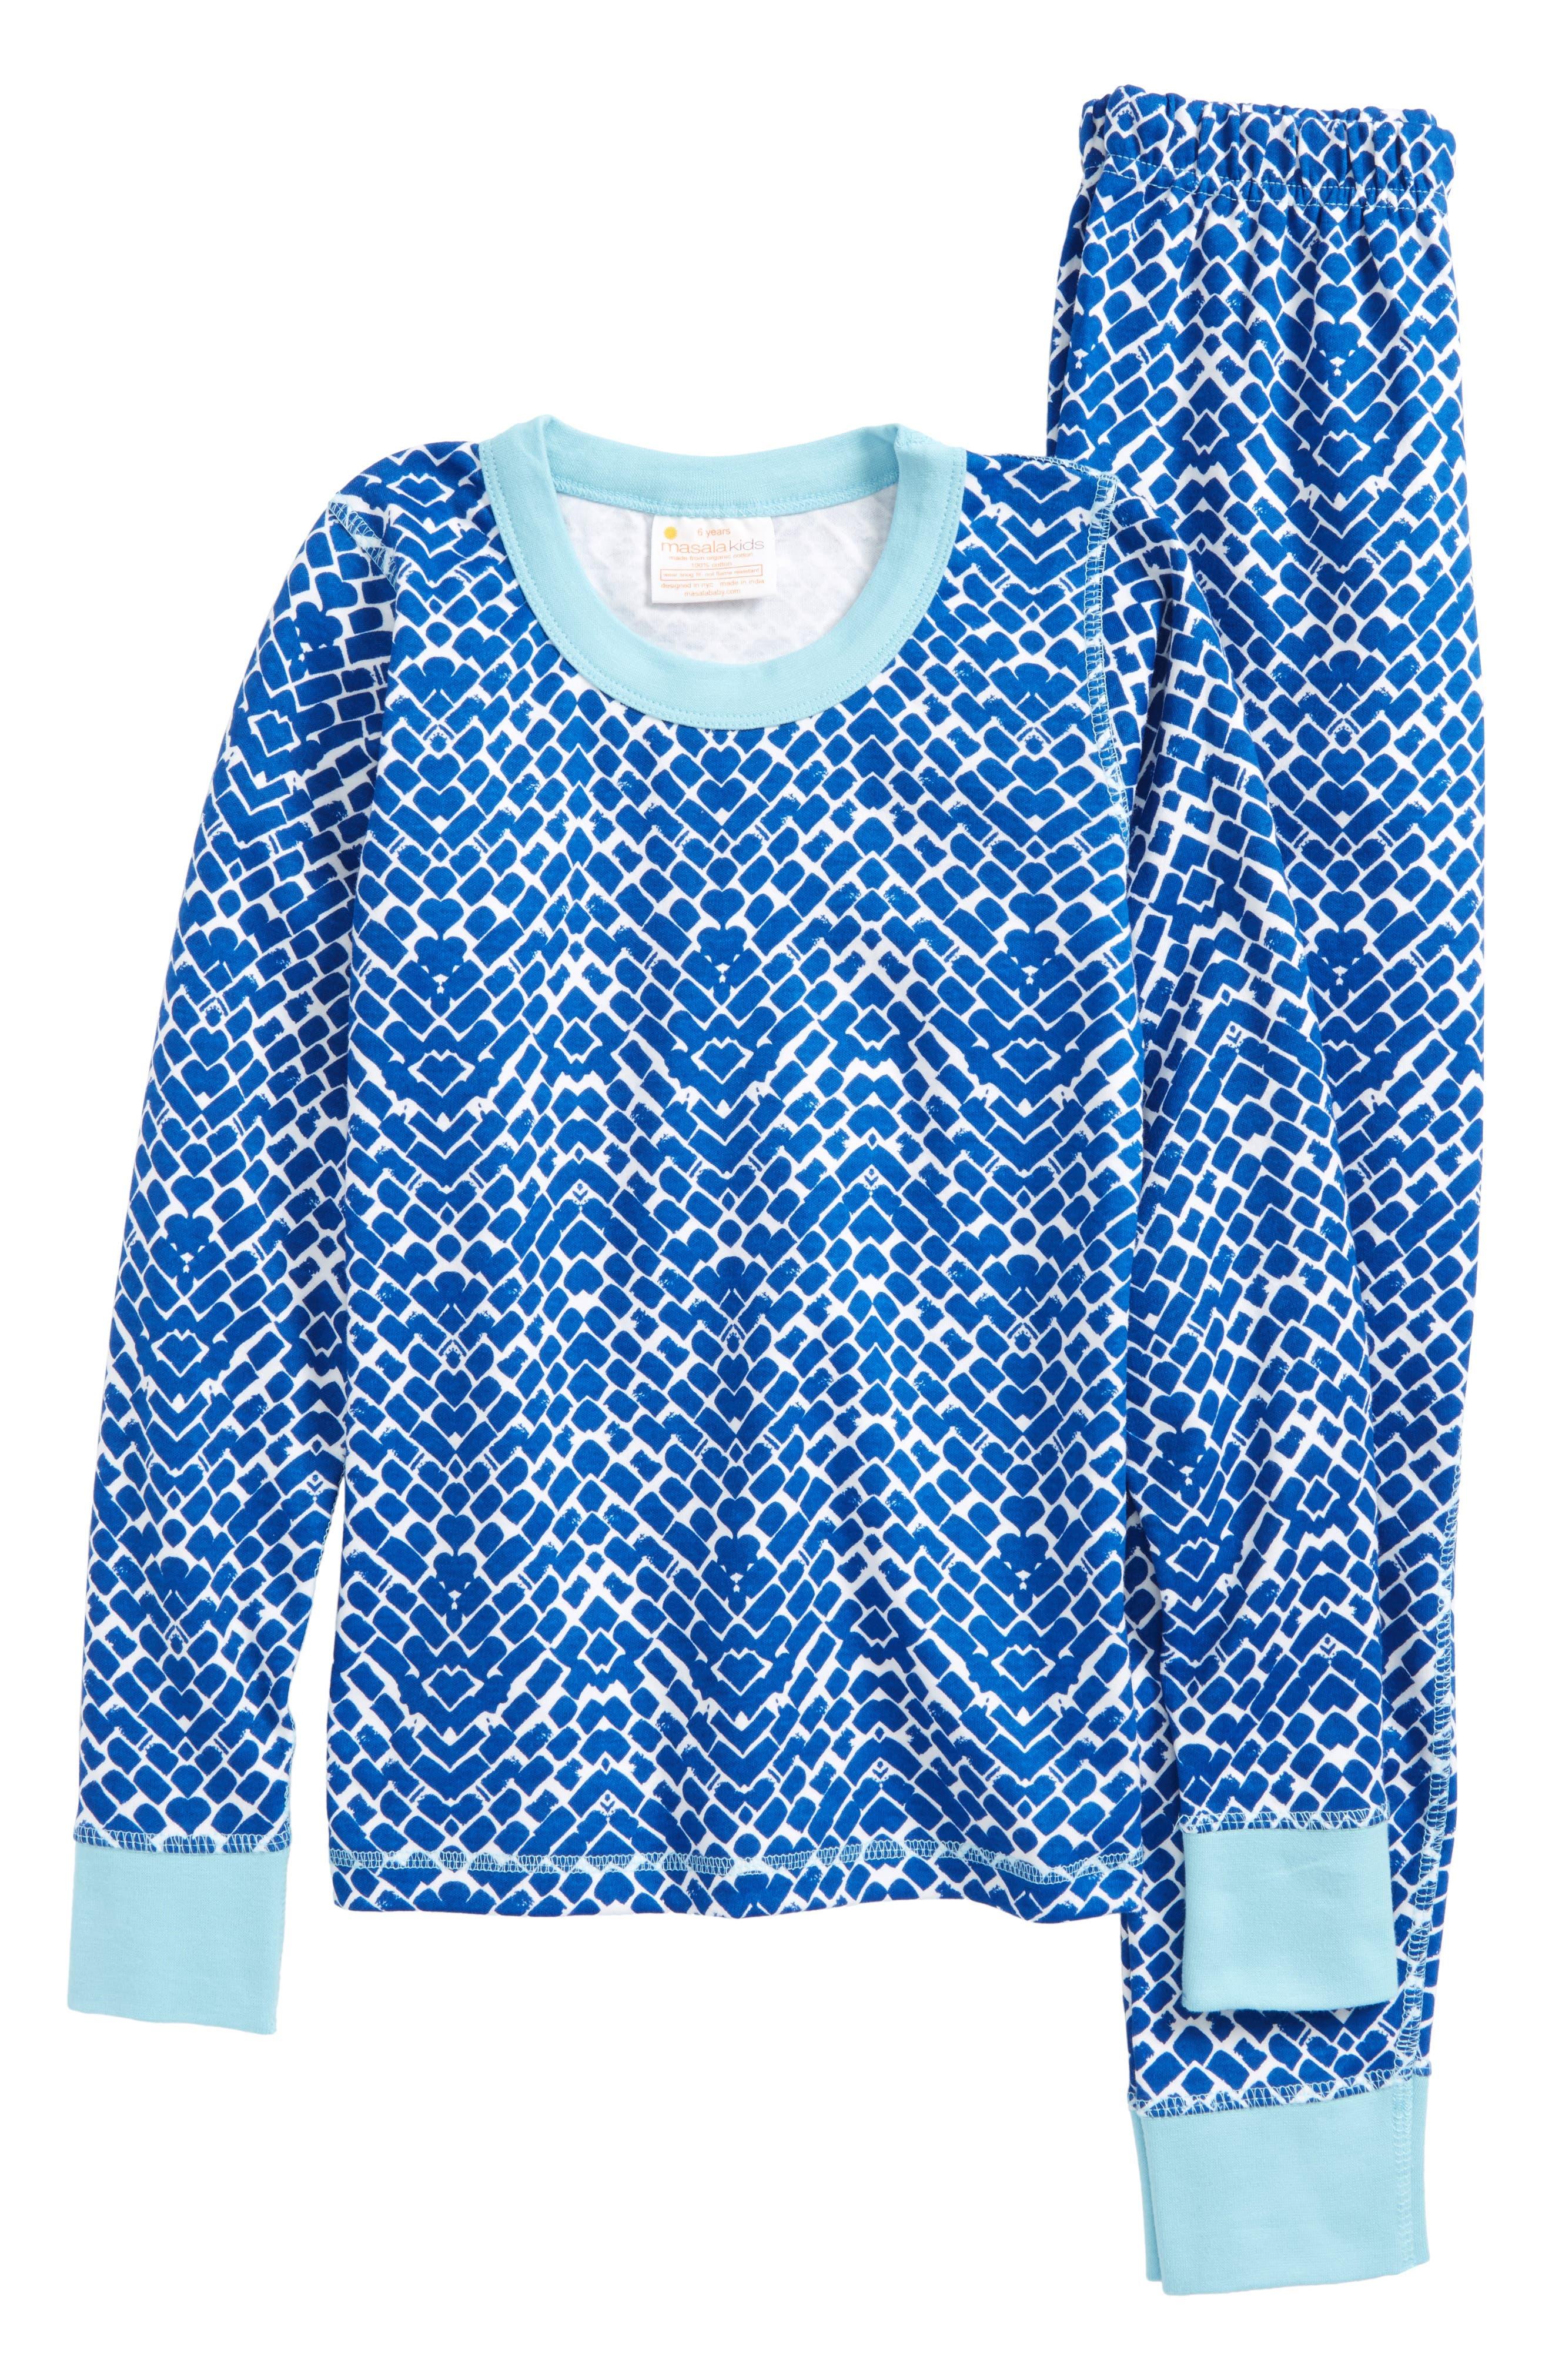 Main Image - Masala Baby Cobblestone Organic Cotton Fitted Two-Piece Pajamas (Toddler Kids, Little Kids & Big Kids)